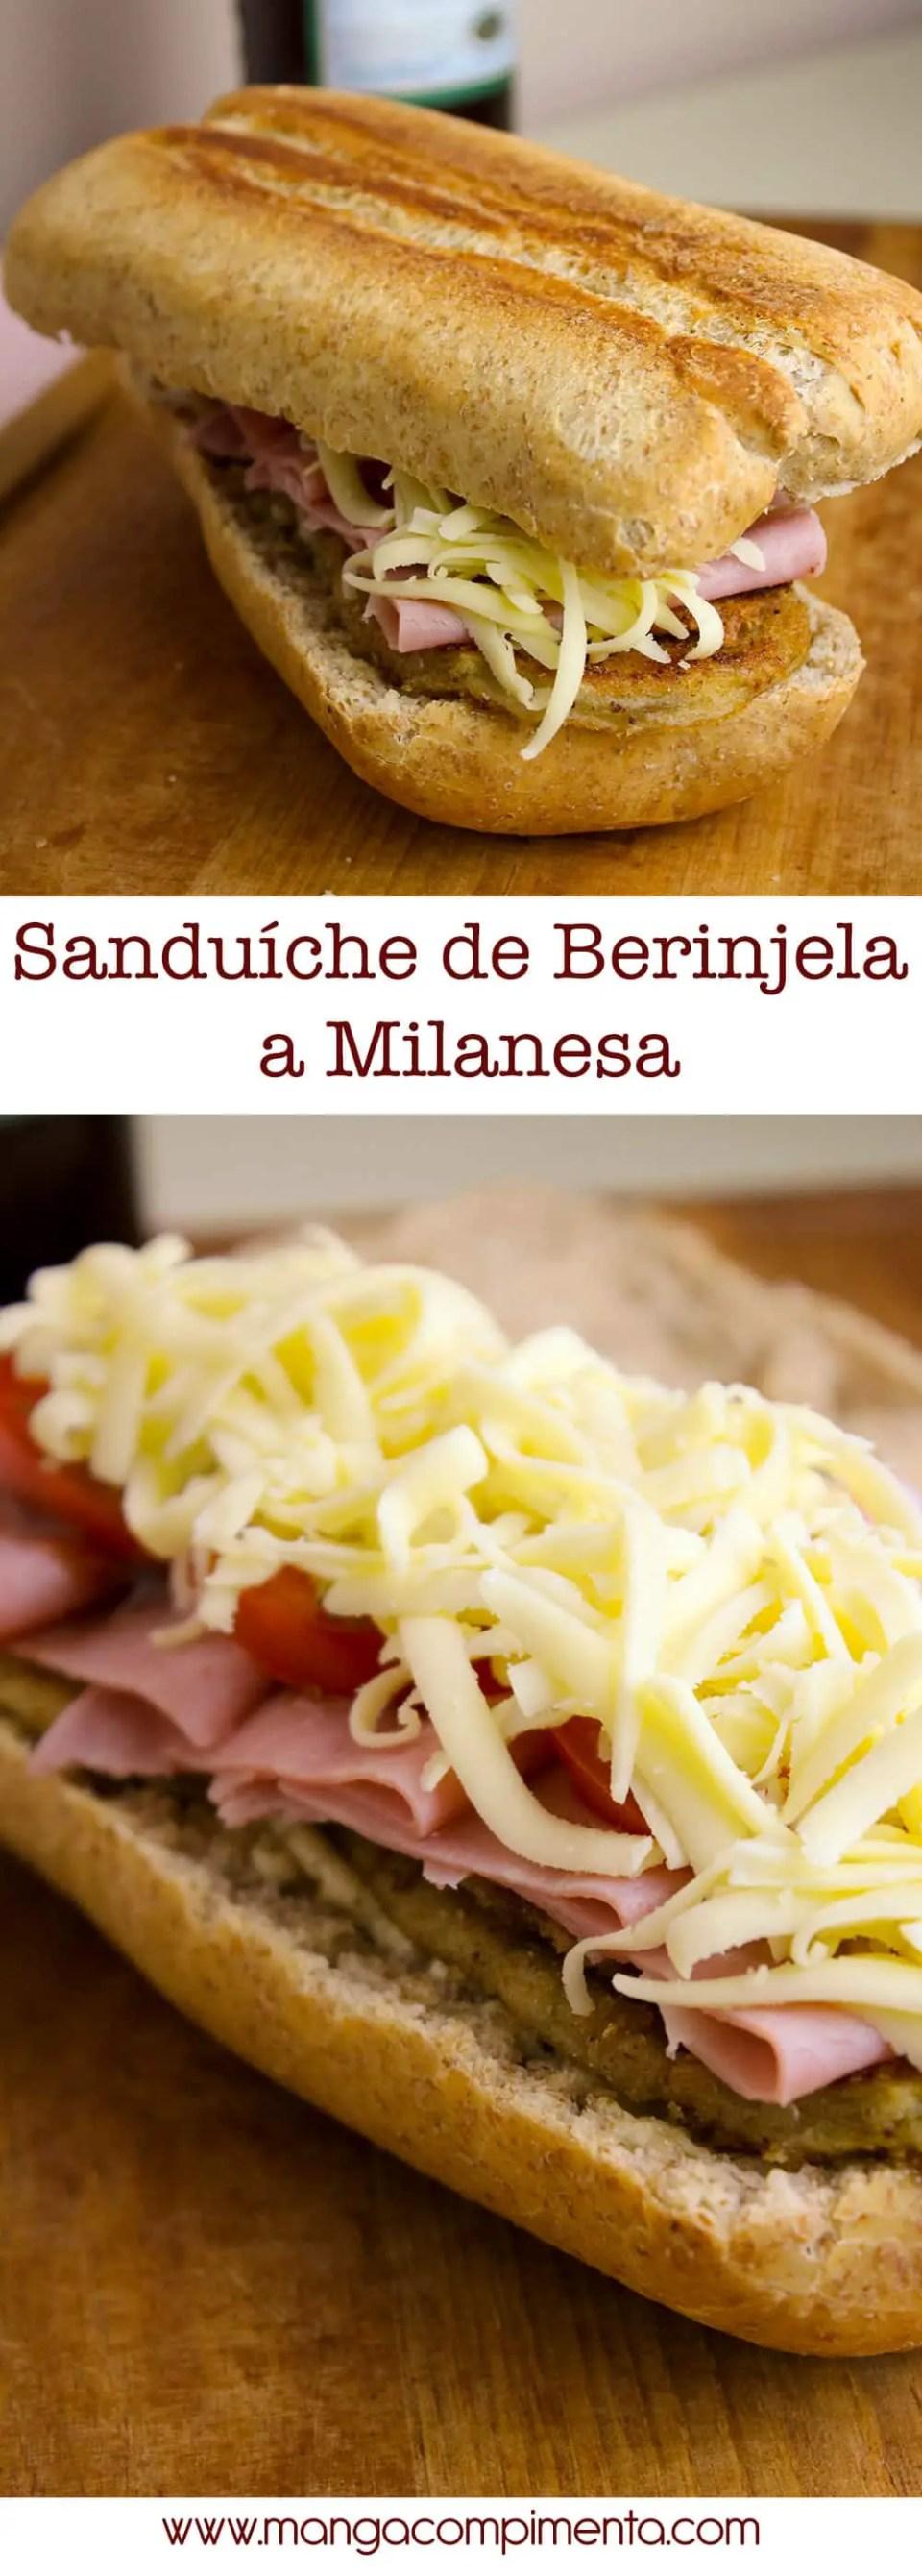 Sanduíche de Berinjela a Milanesa